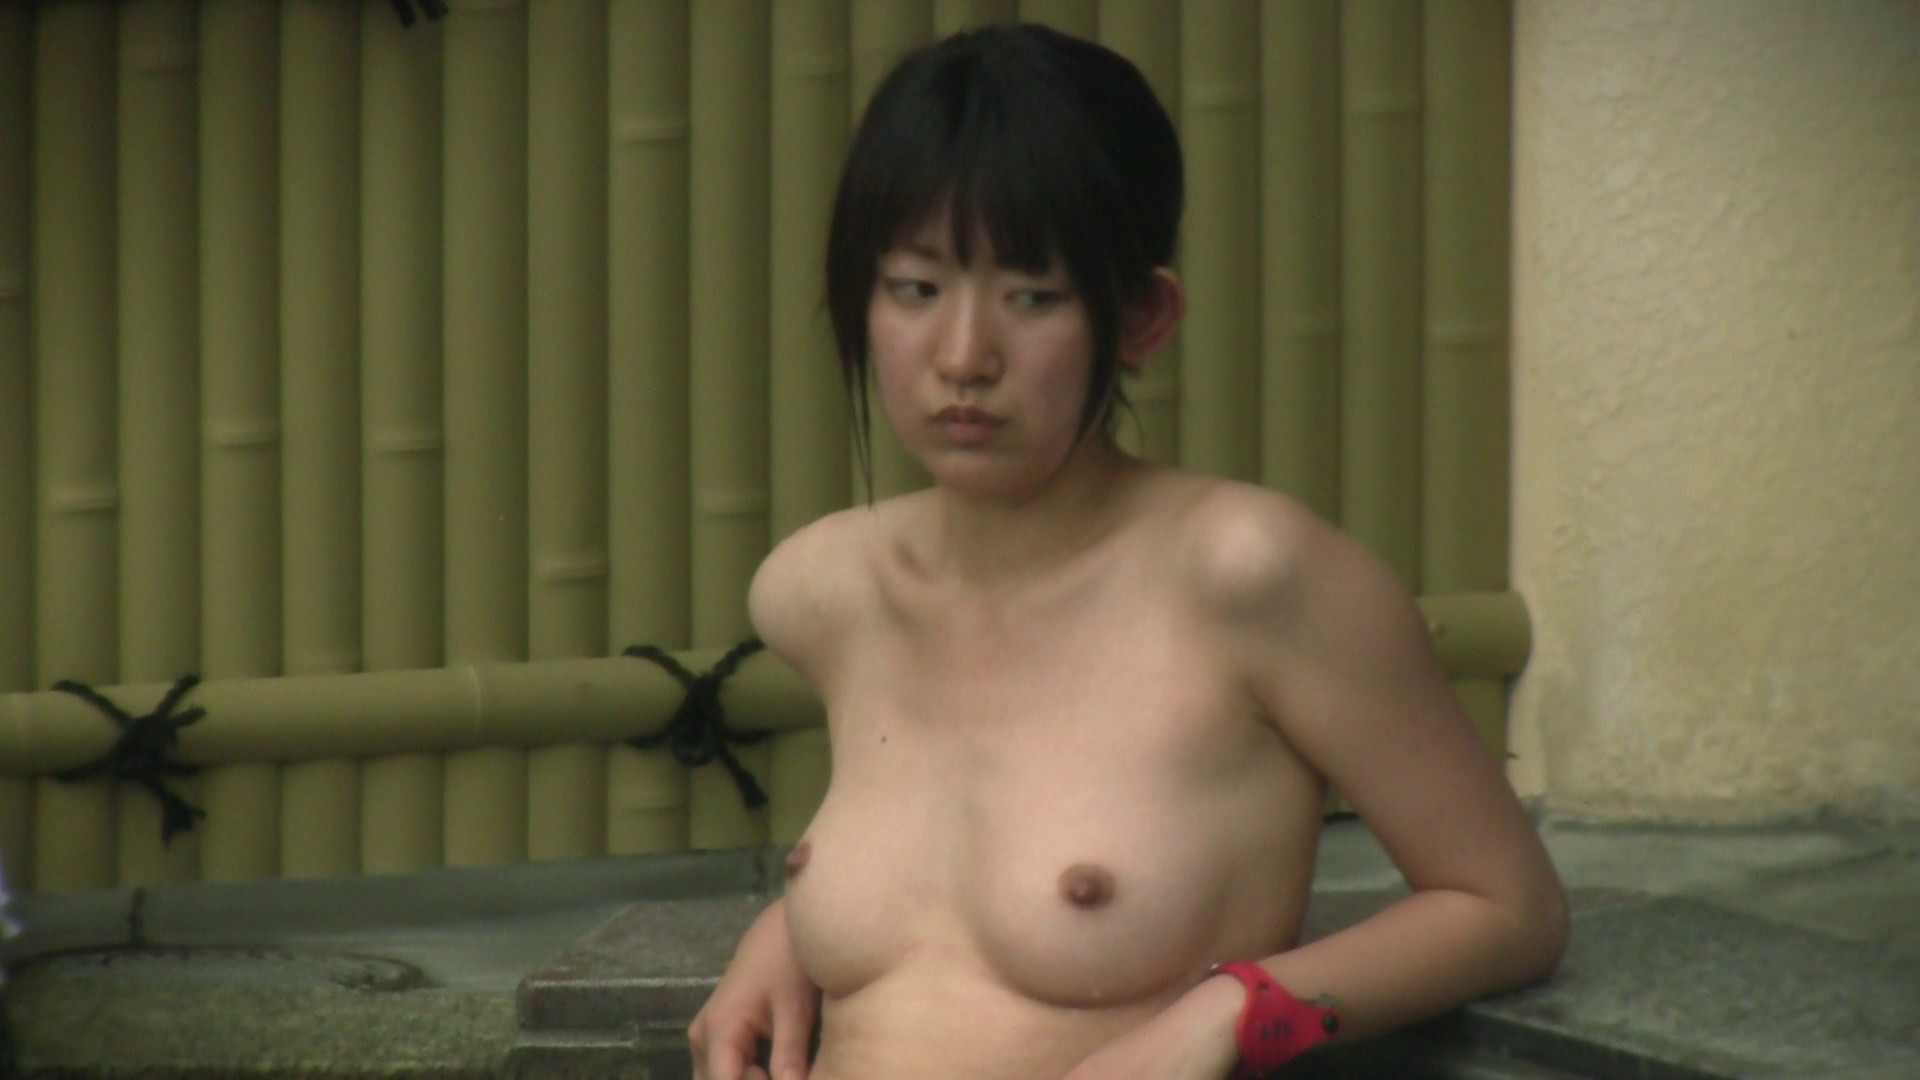 Aquaな露天風呂Vol.144 盗撮 | HなOL  93pic 12